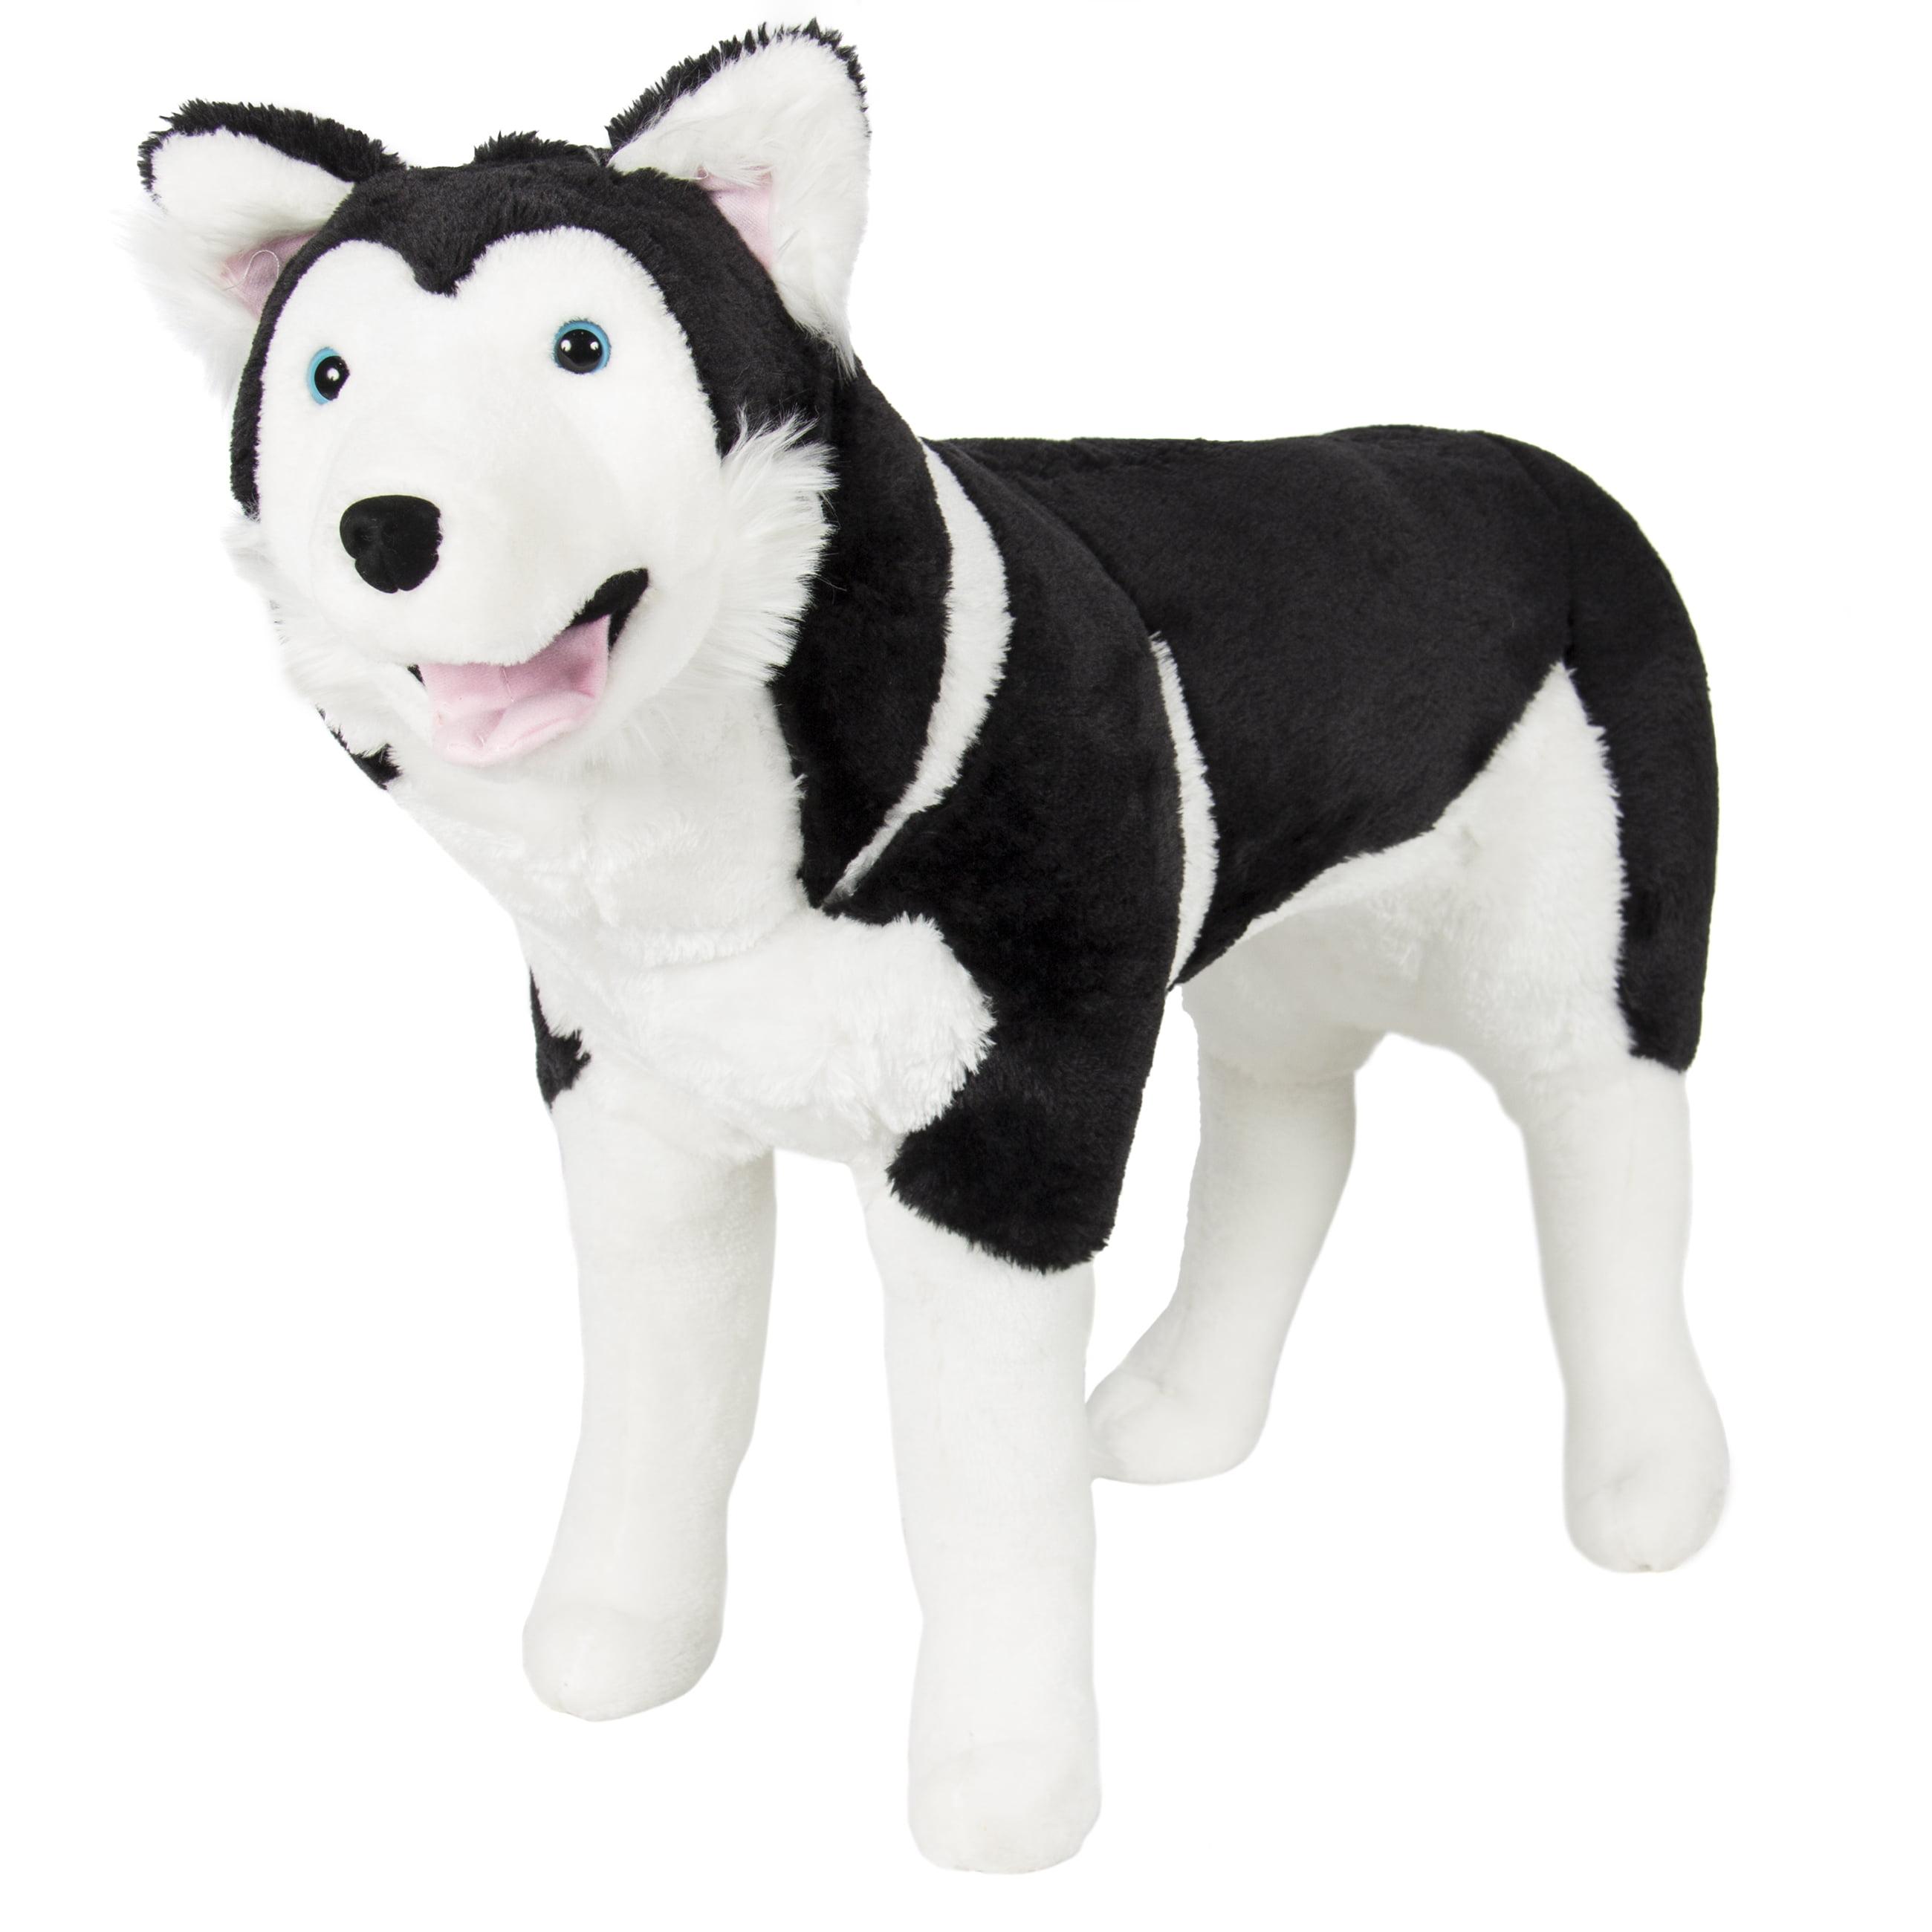 Best Choice Products Large Soft Plush Realistic Stuffed Animal Husky